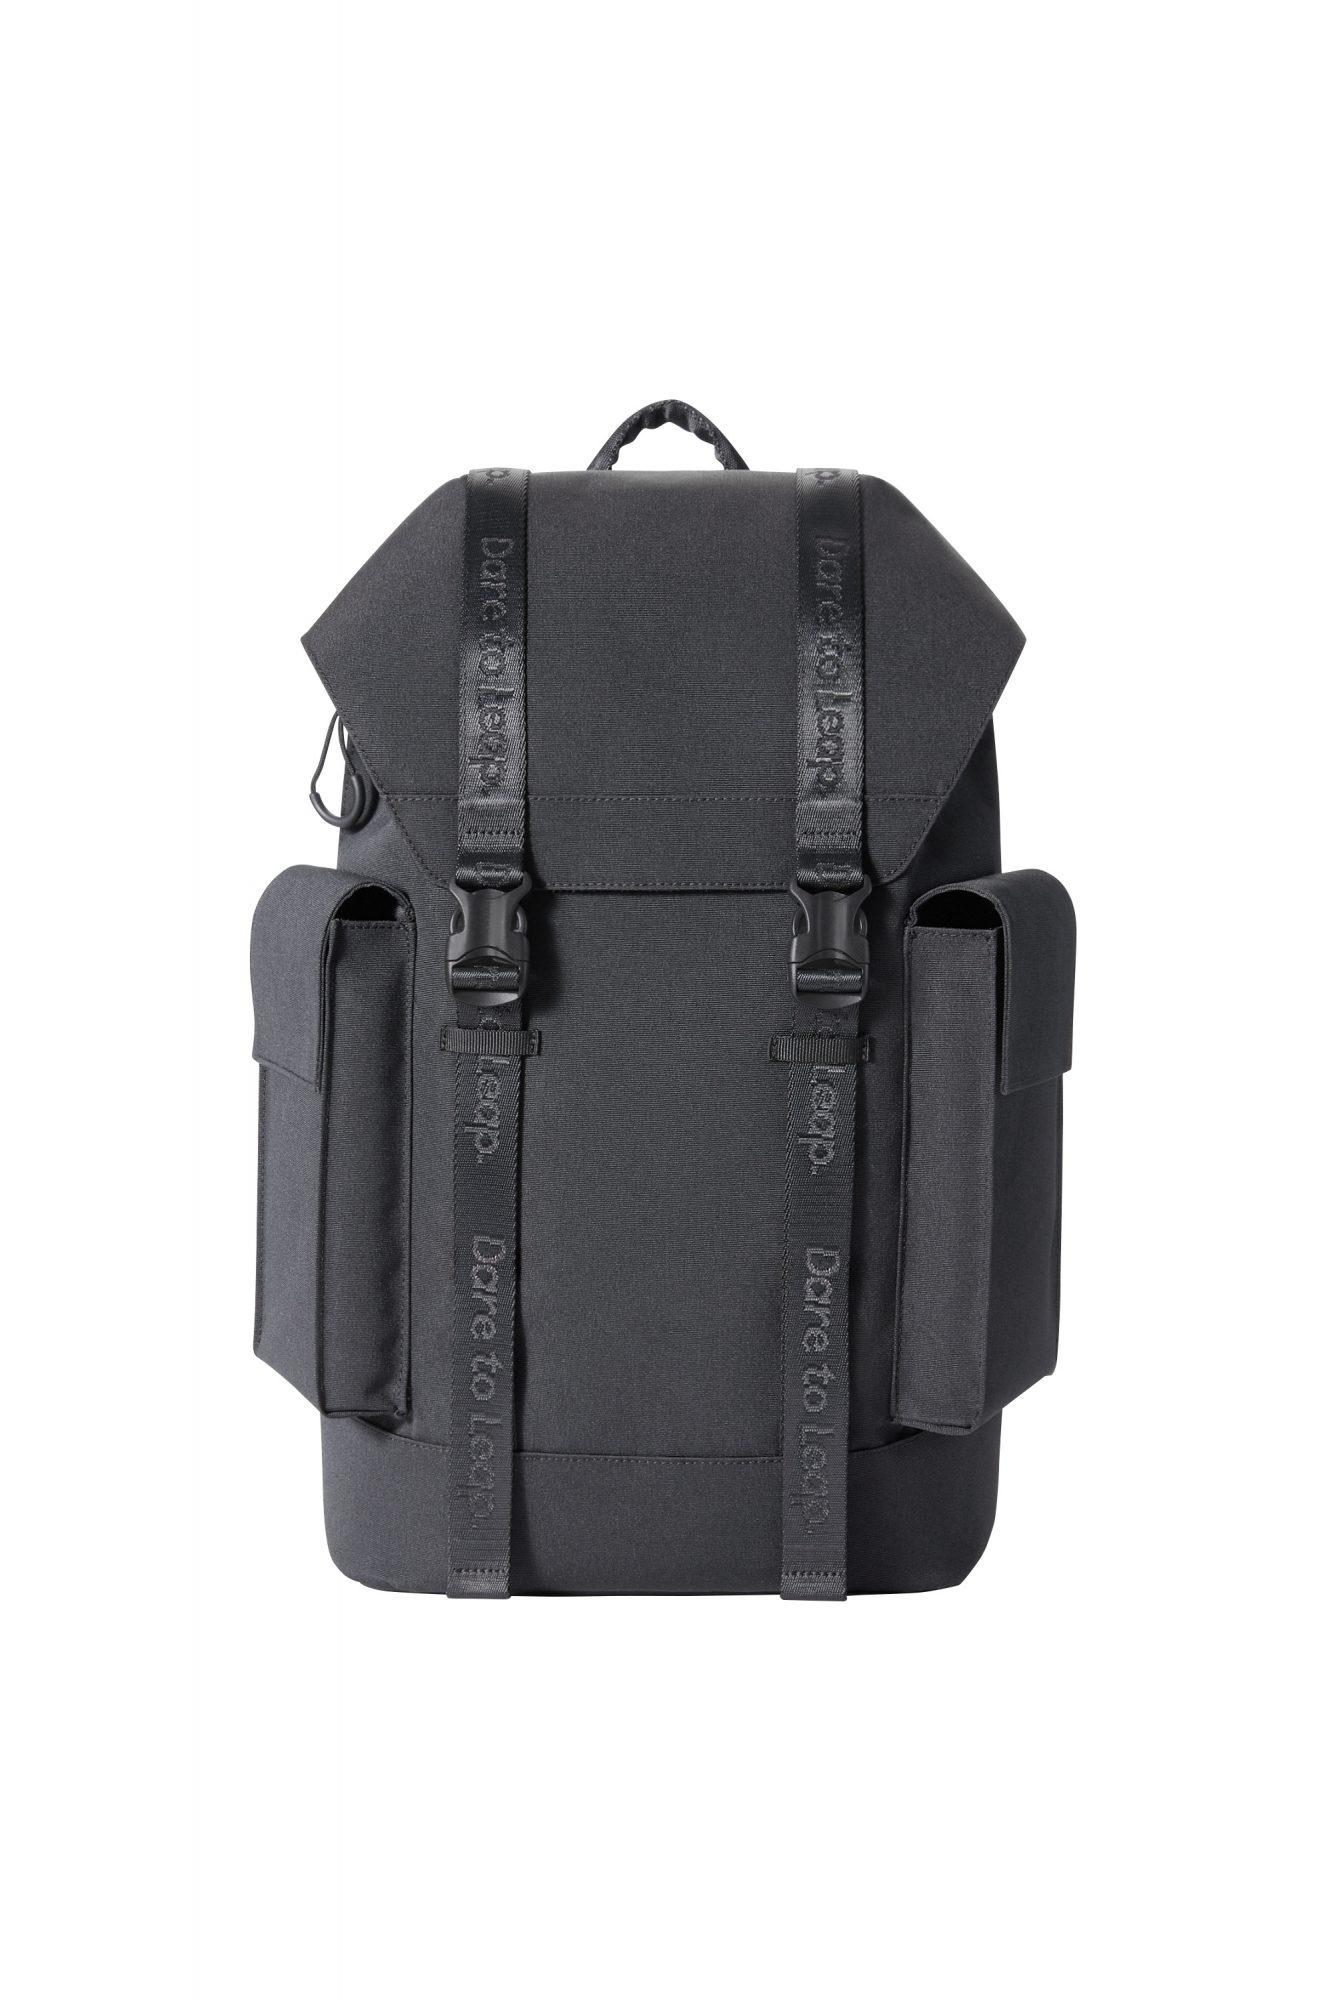 realme Adventure Backpack 1